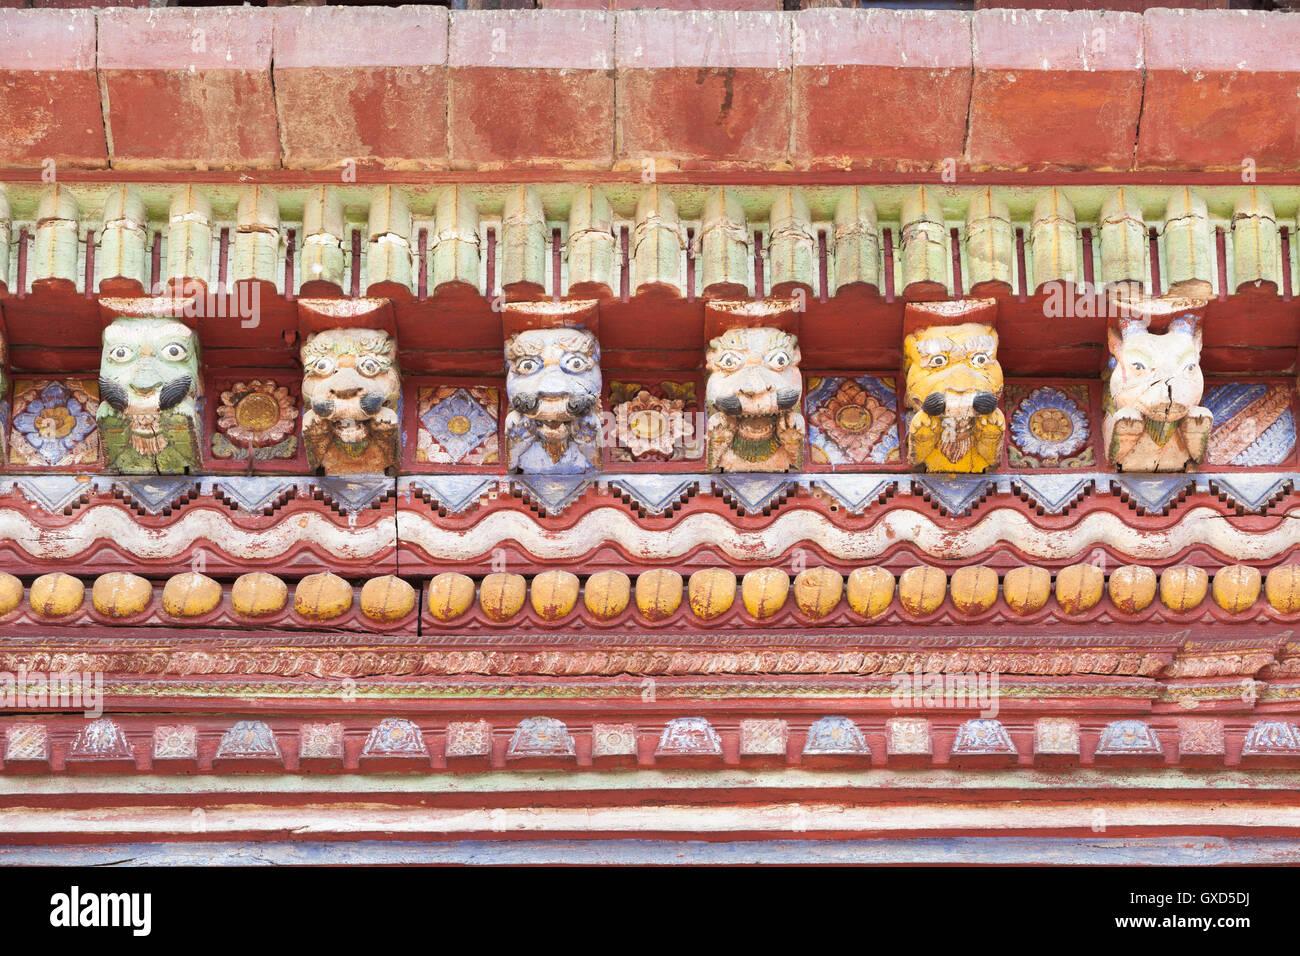 Decorative details in temple roof, hindu deities and demons, Changu Narayan temple near Bhaktapur, Nepal - Stock Image